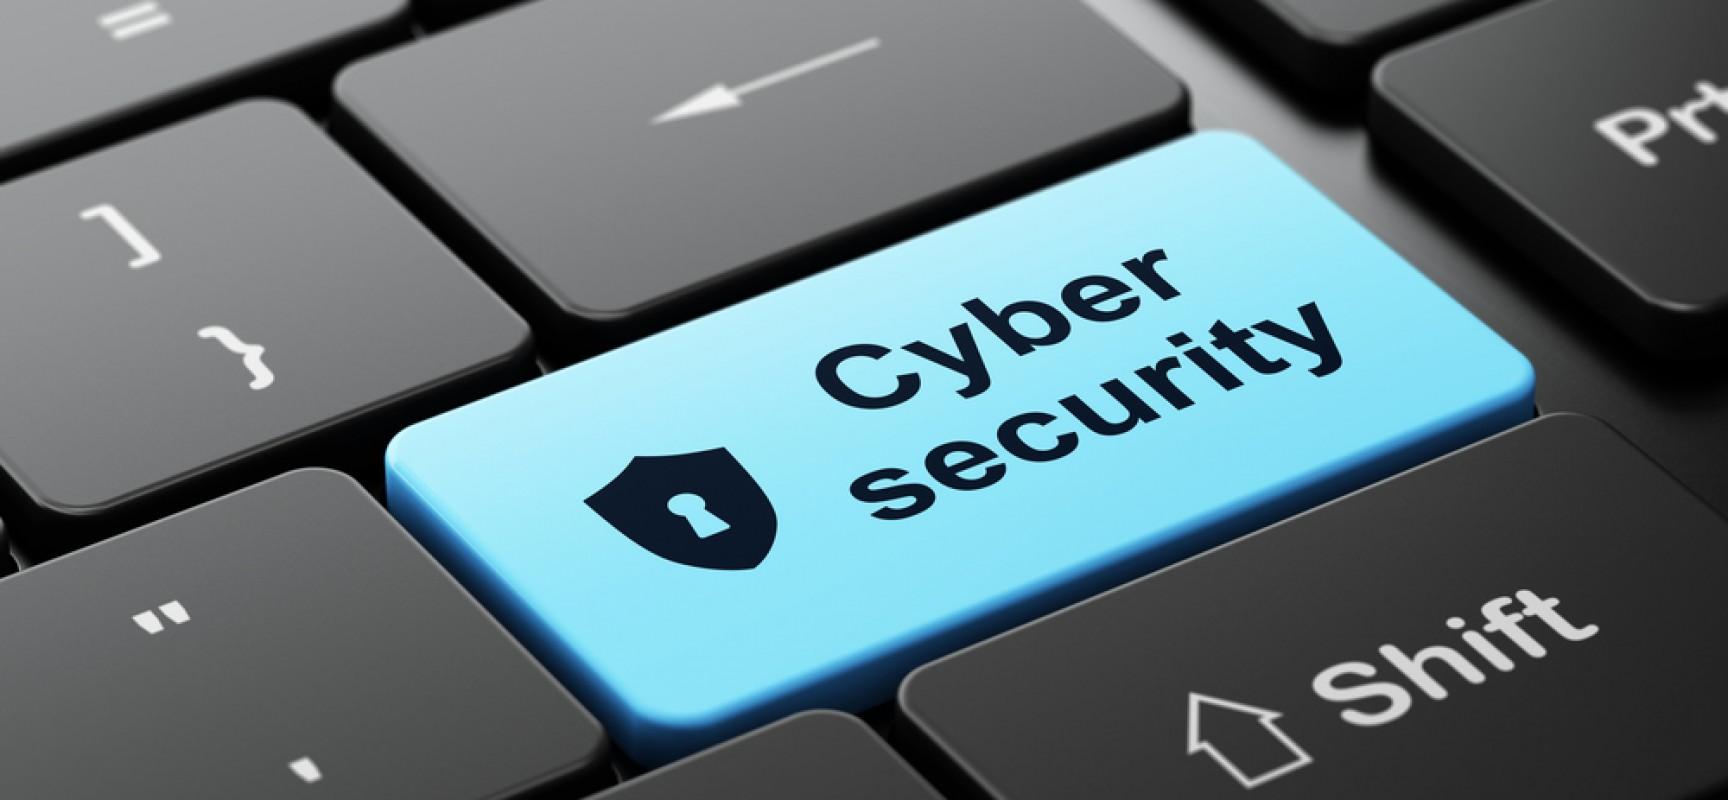 Cognosec tecknar Cybersecurity kontrakt i Sydafrika